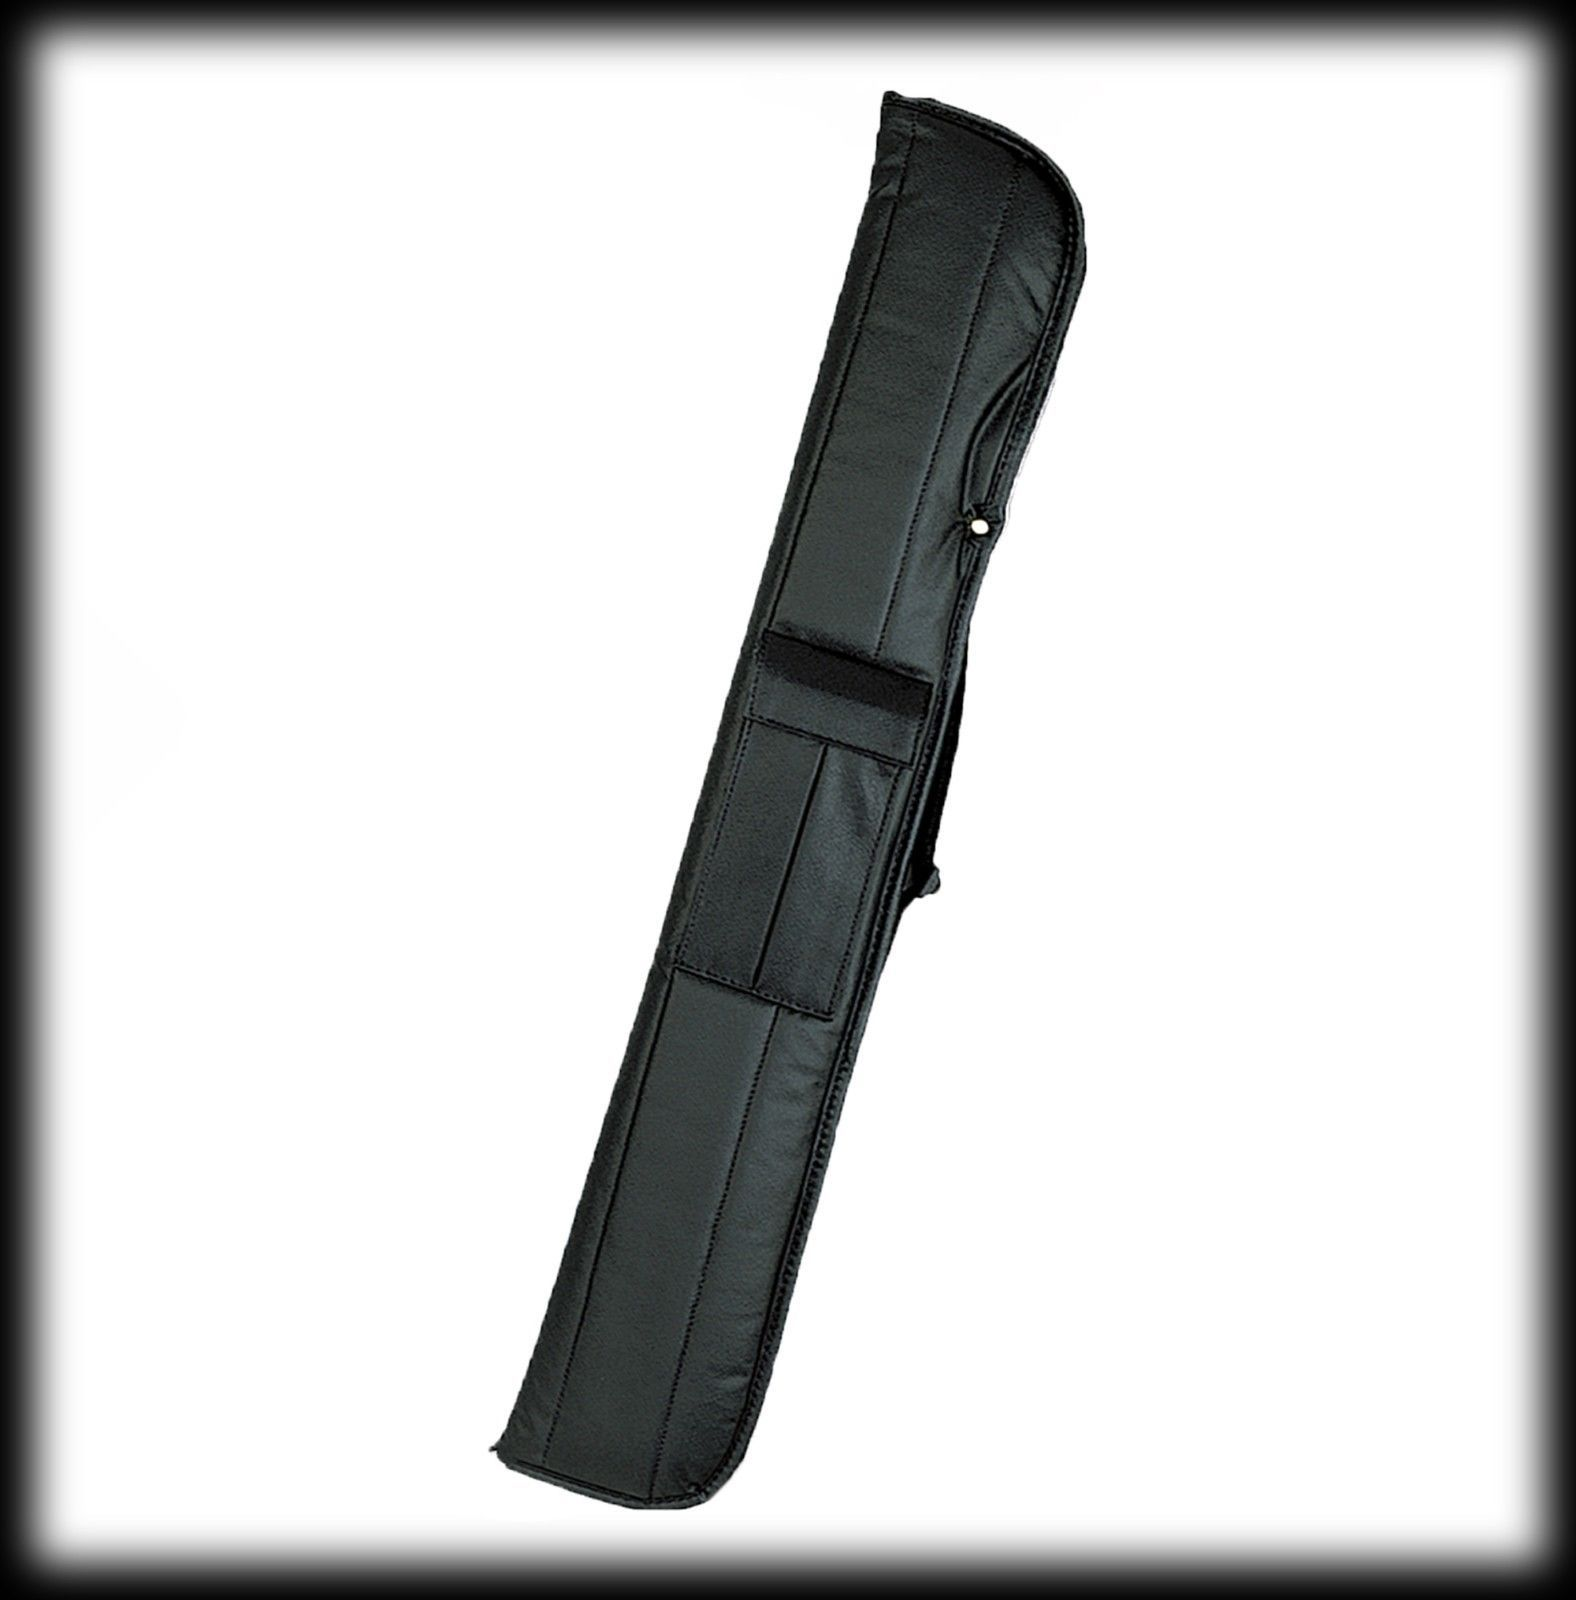 "New Athena ATH38 Pool Cue Stick - Black and Pink ""Heartburn""  17-21 oz & Case"